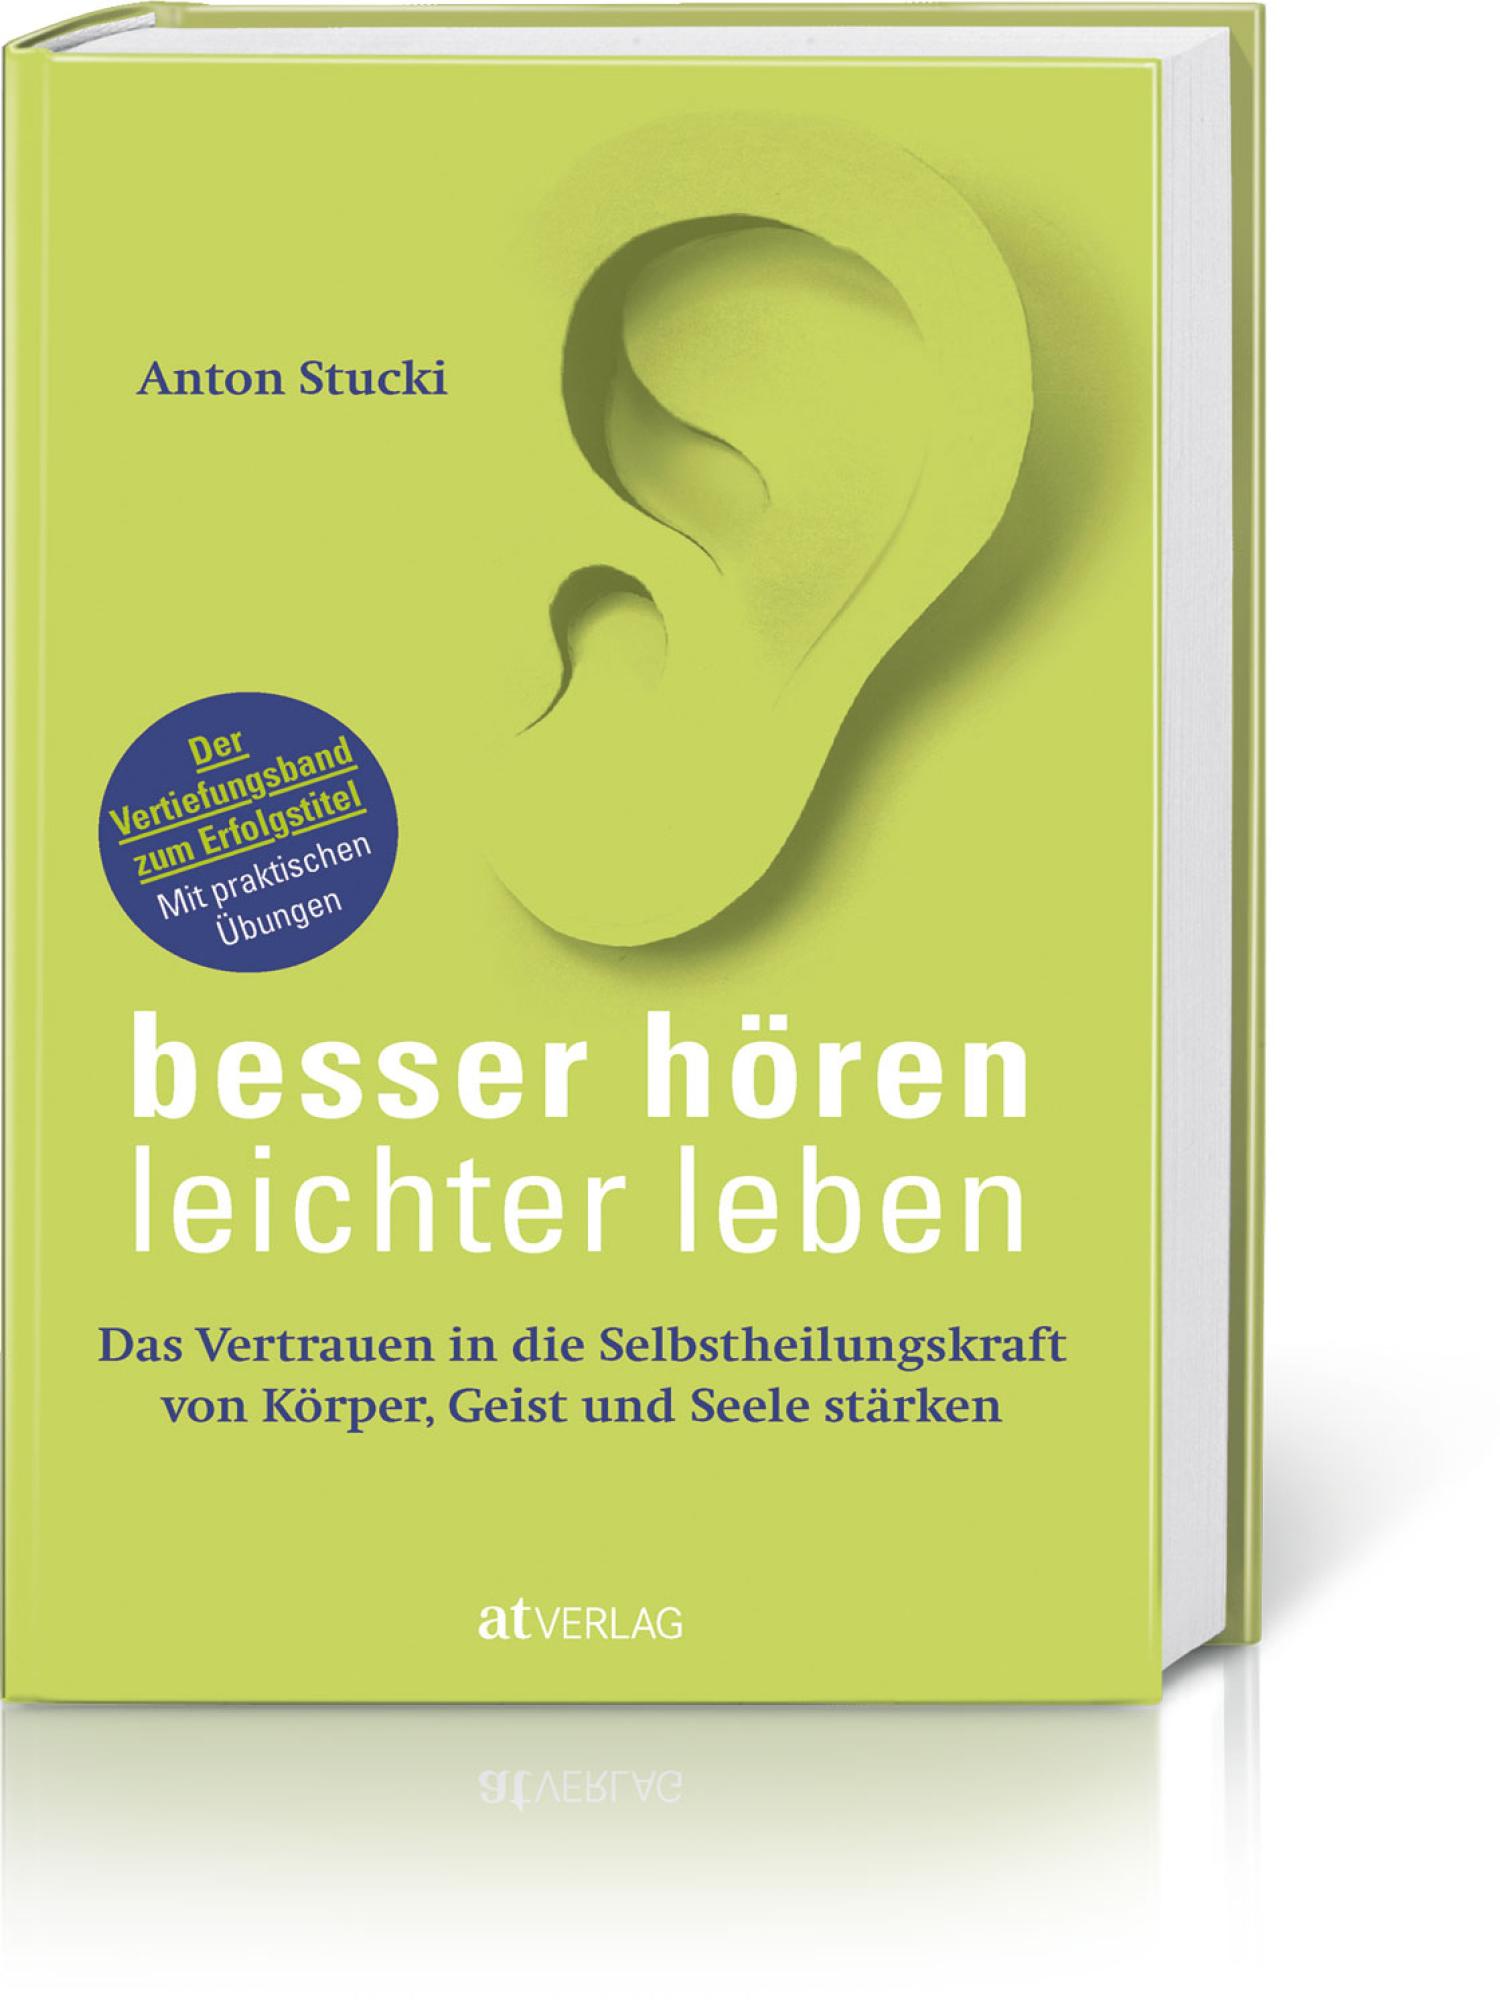 Besser hören – leichter leben, Produktbild 1